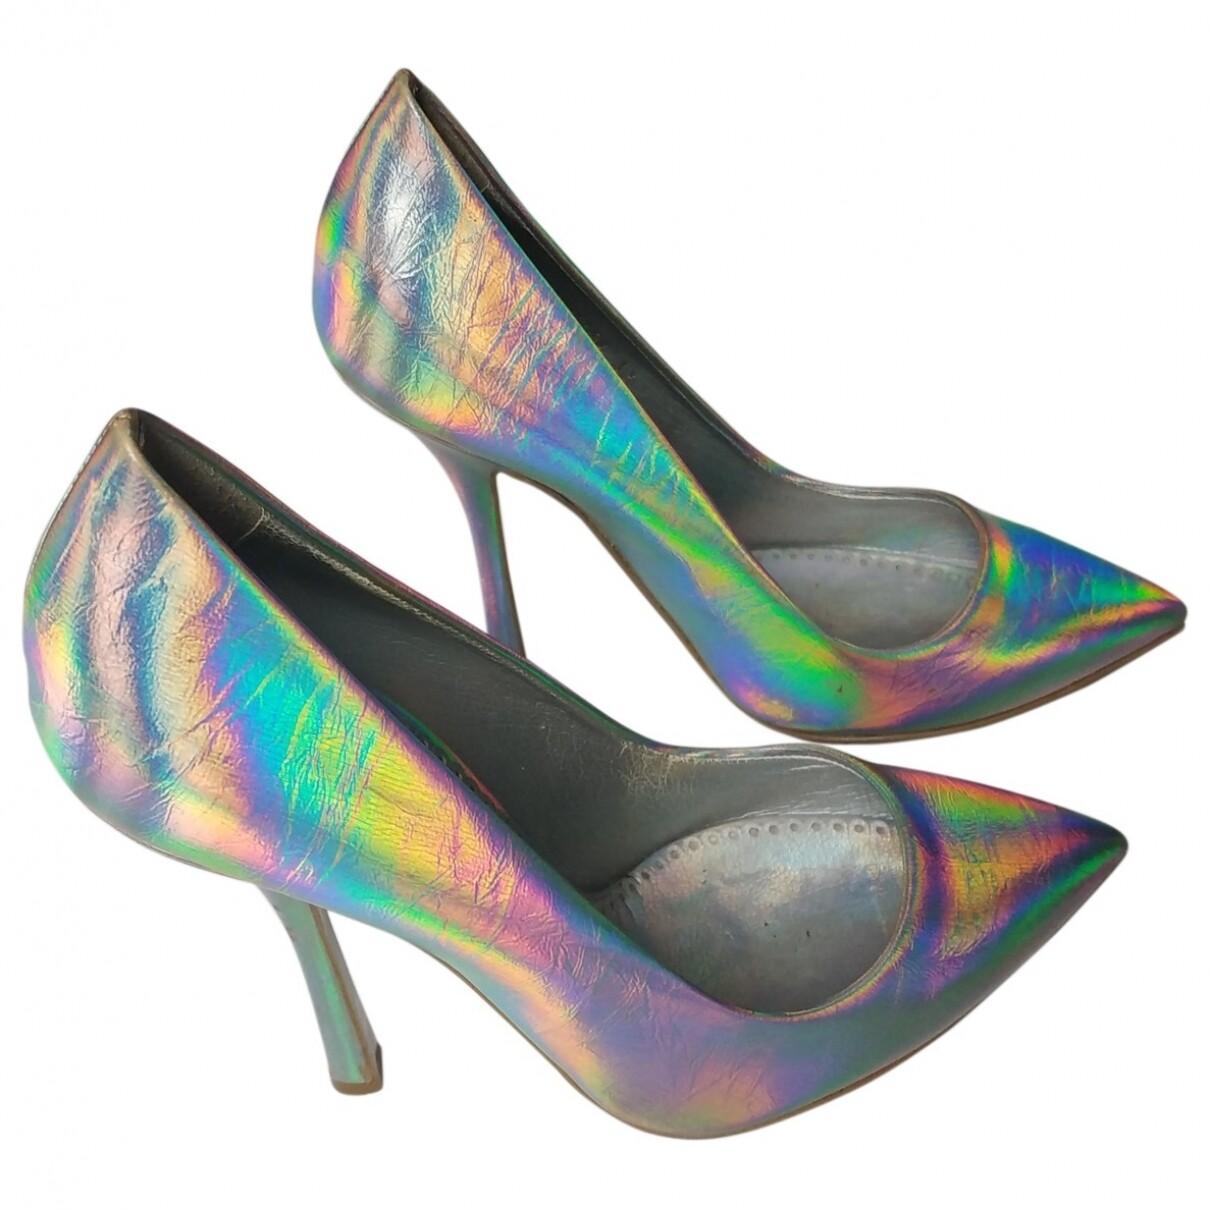 Stella Mc Cartney heels size 37